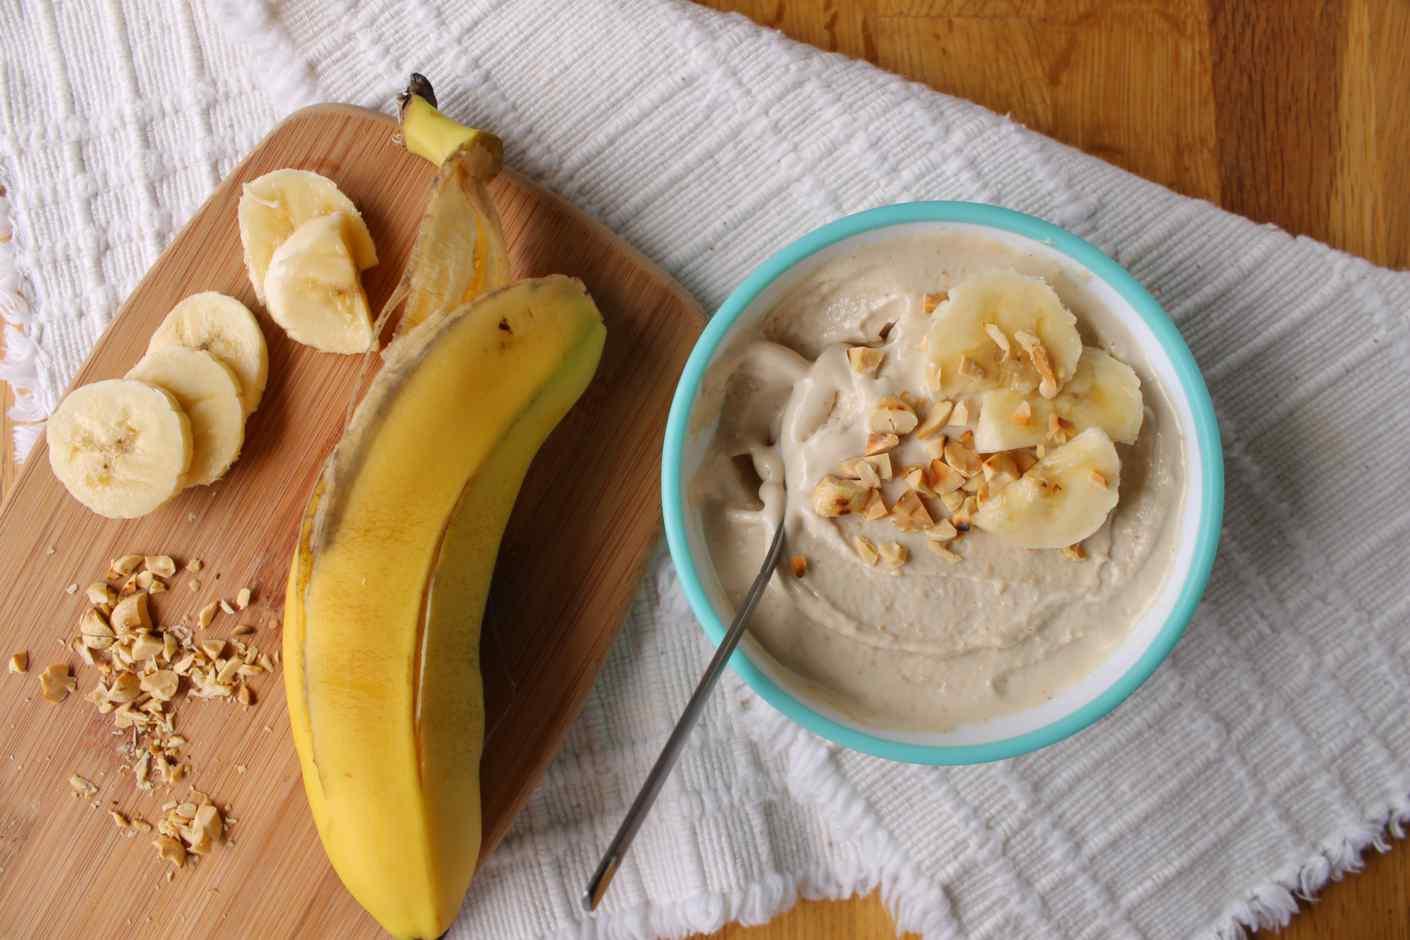 peanut butterbanana frozen yogurt recipe sugarfree or